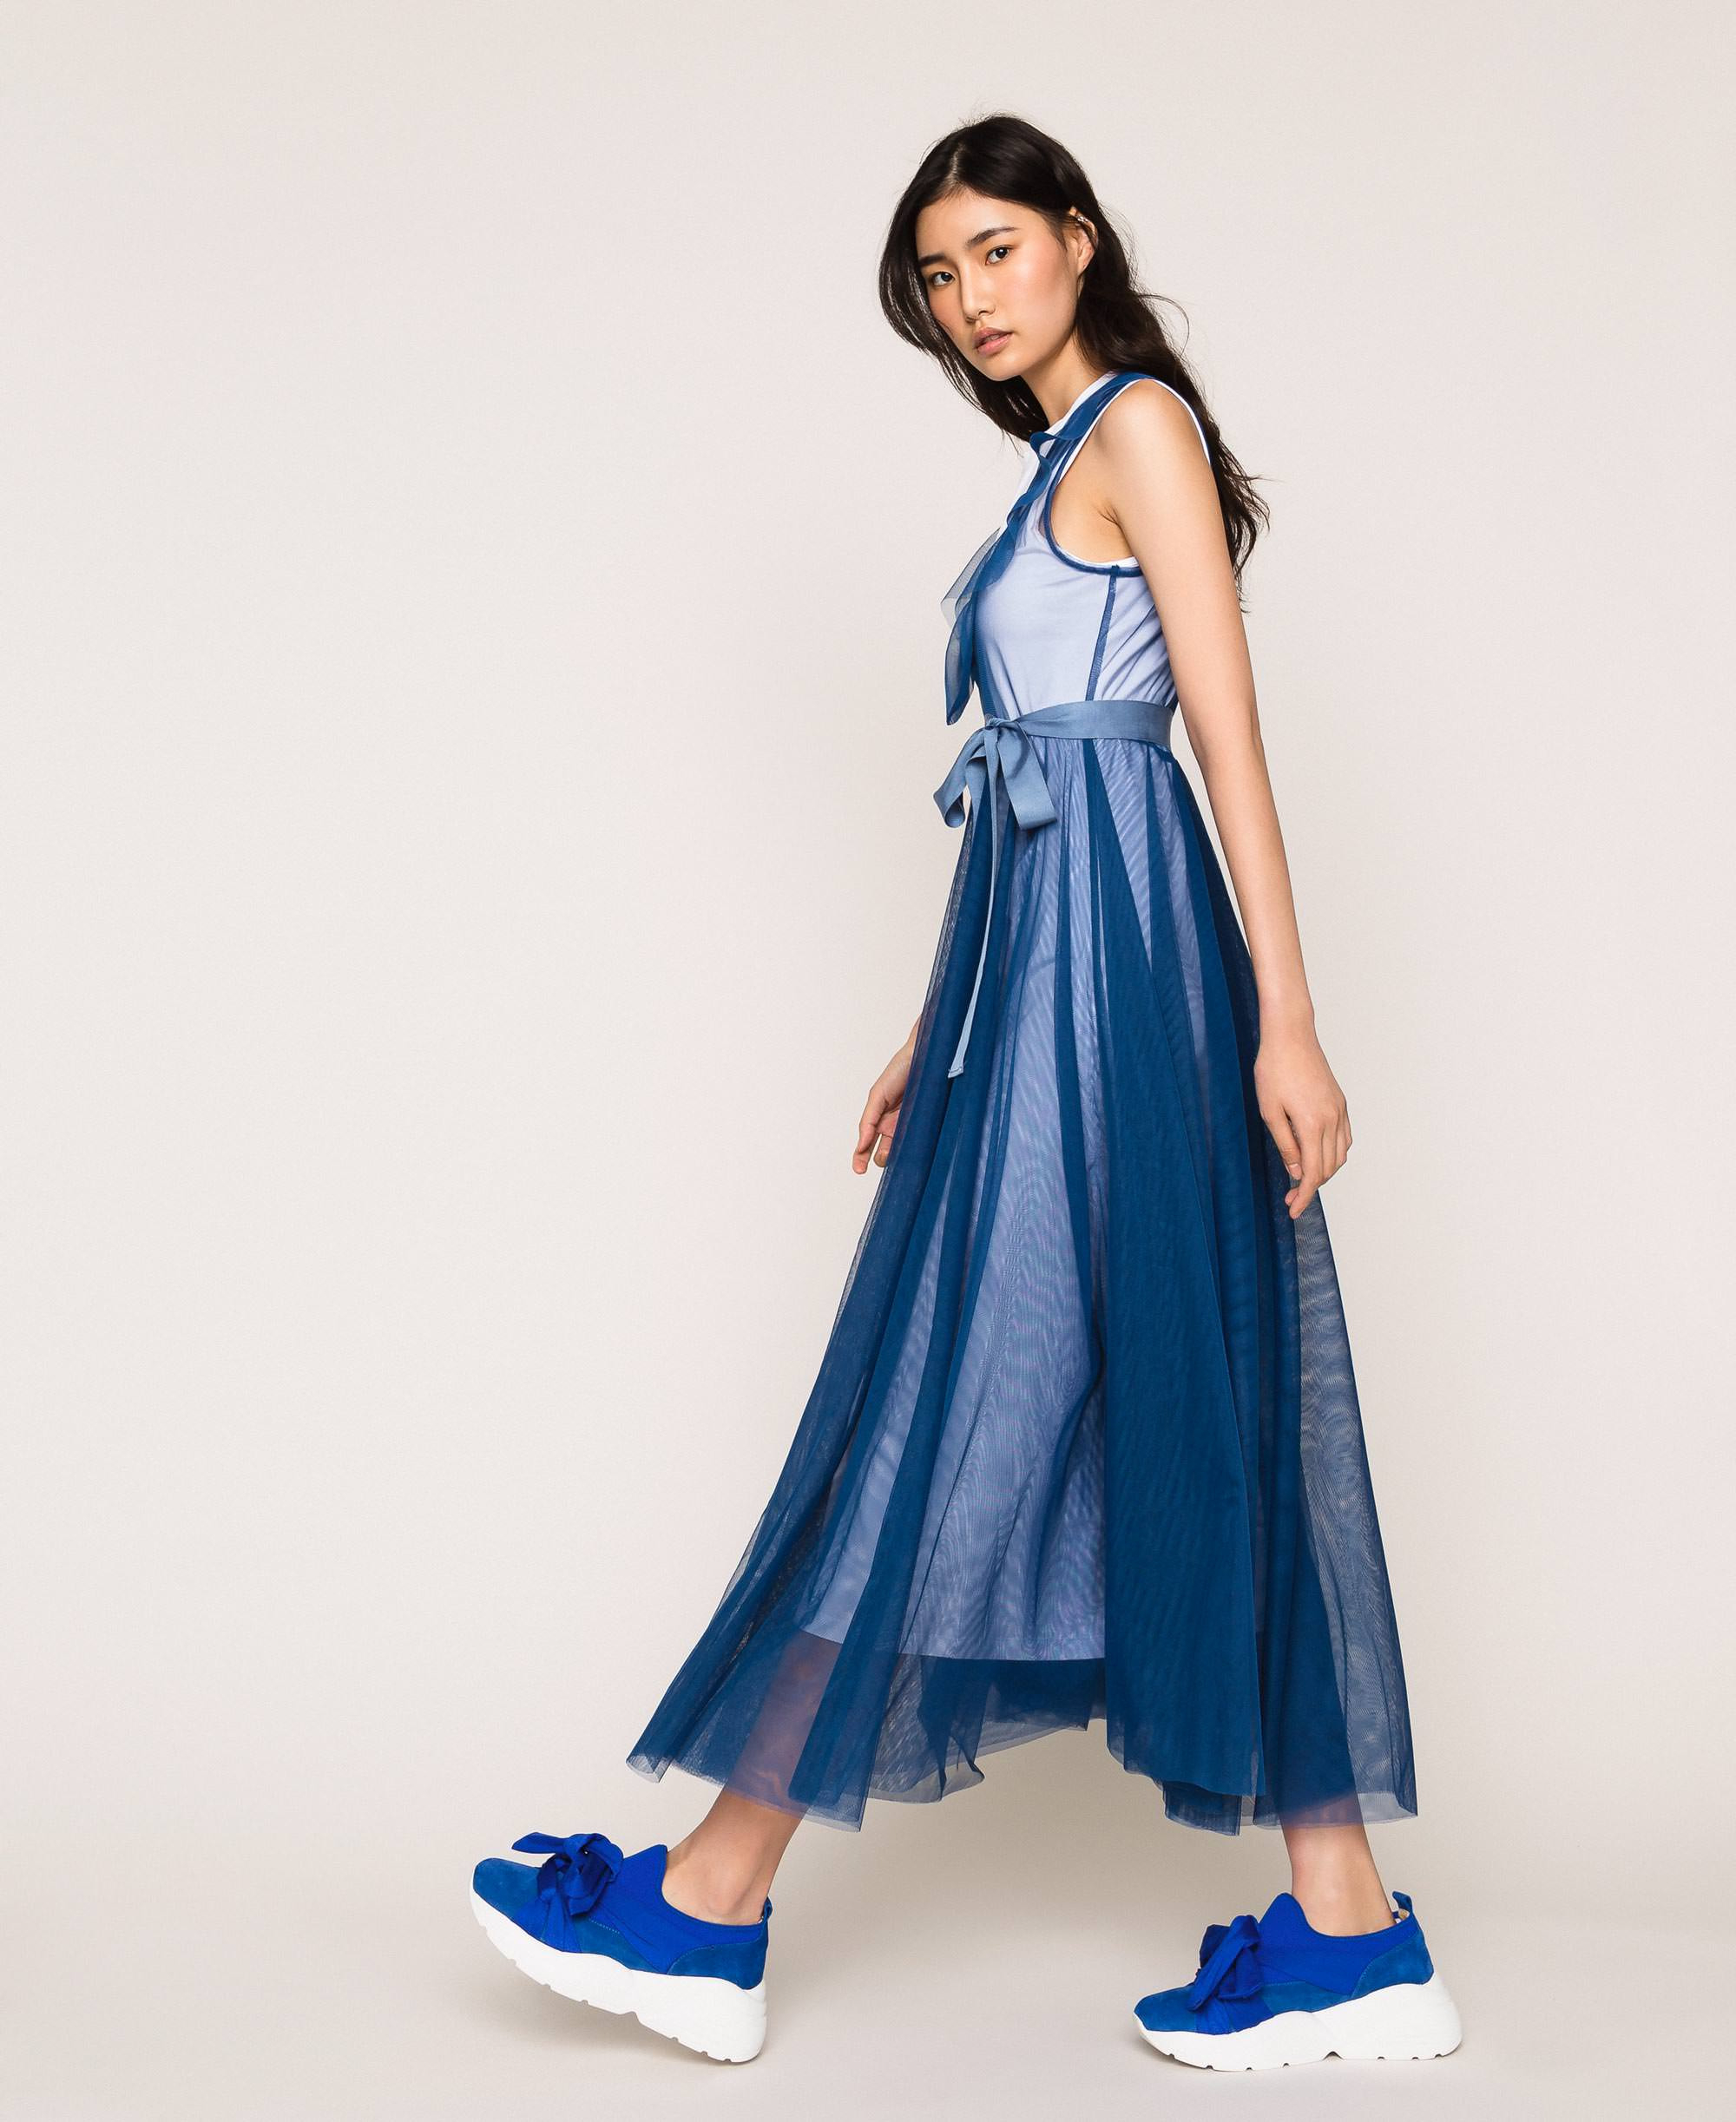 Langes Kleid Aus Tüll Mit Volant Frau Blau  Twinset Milano